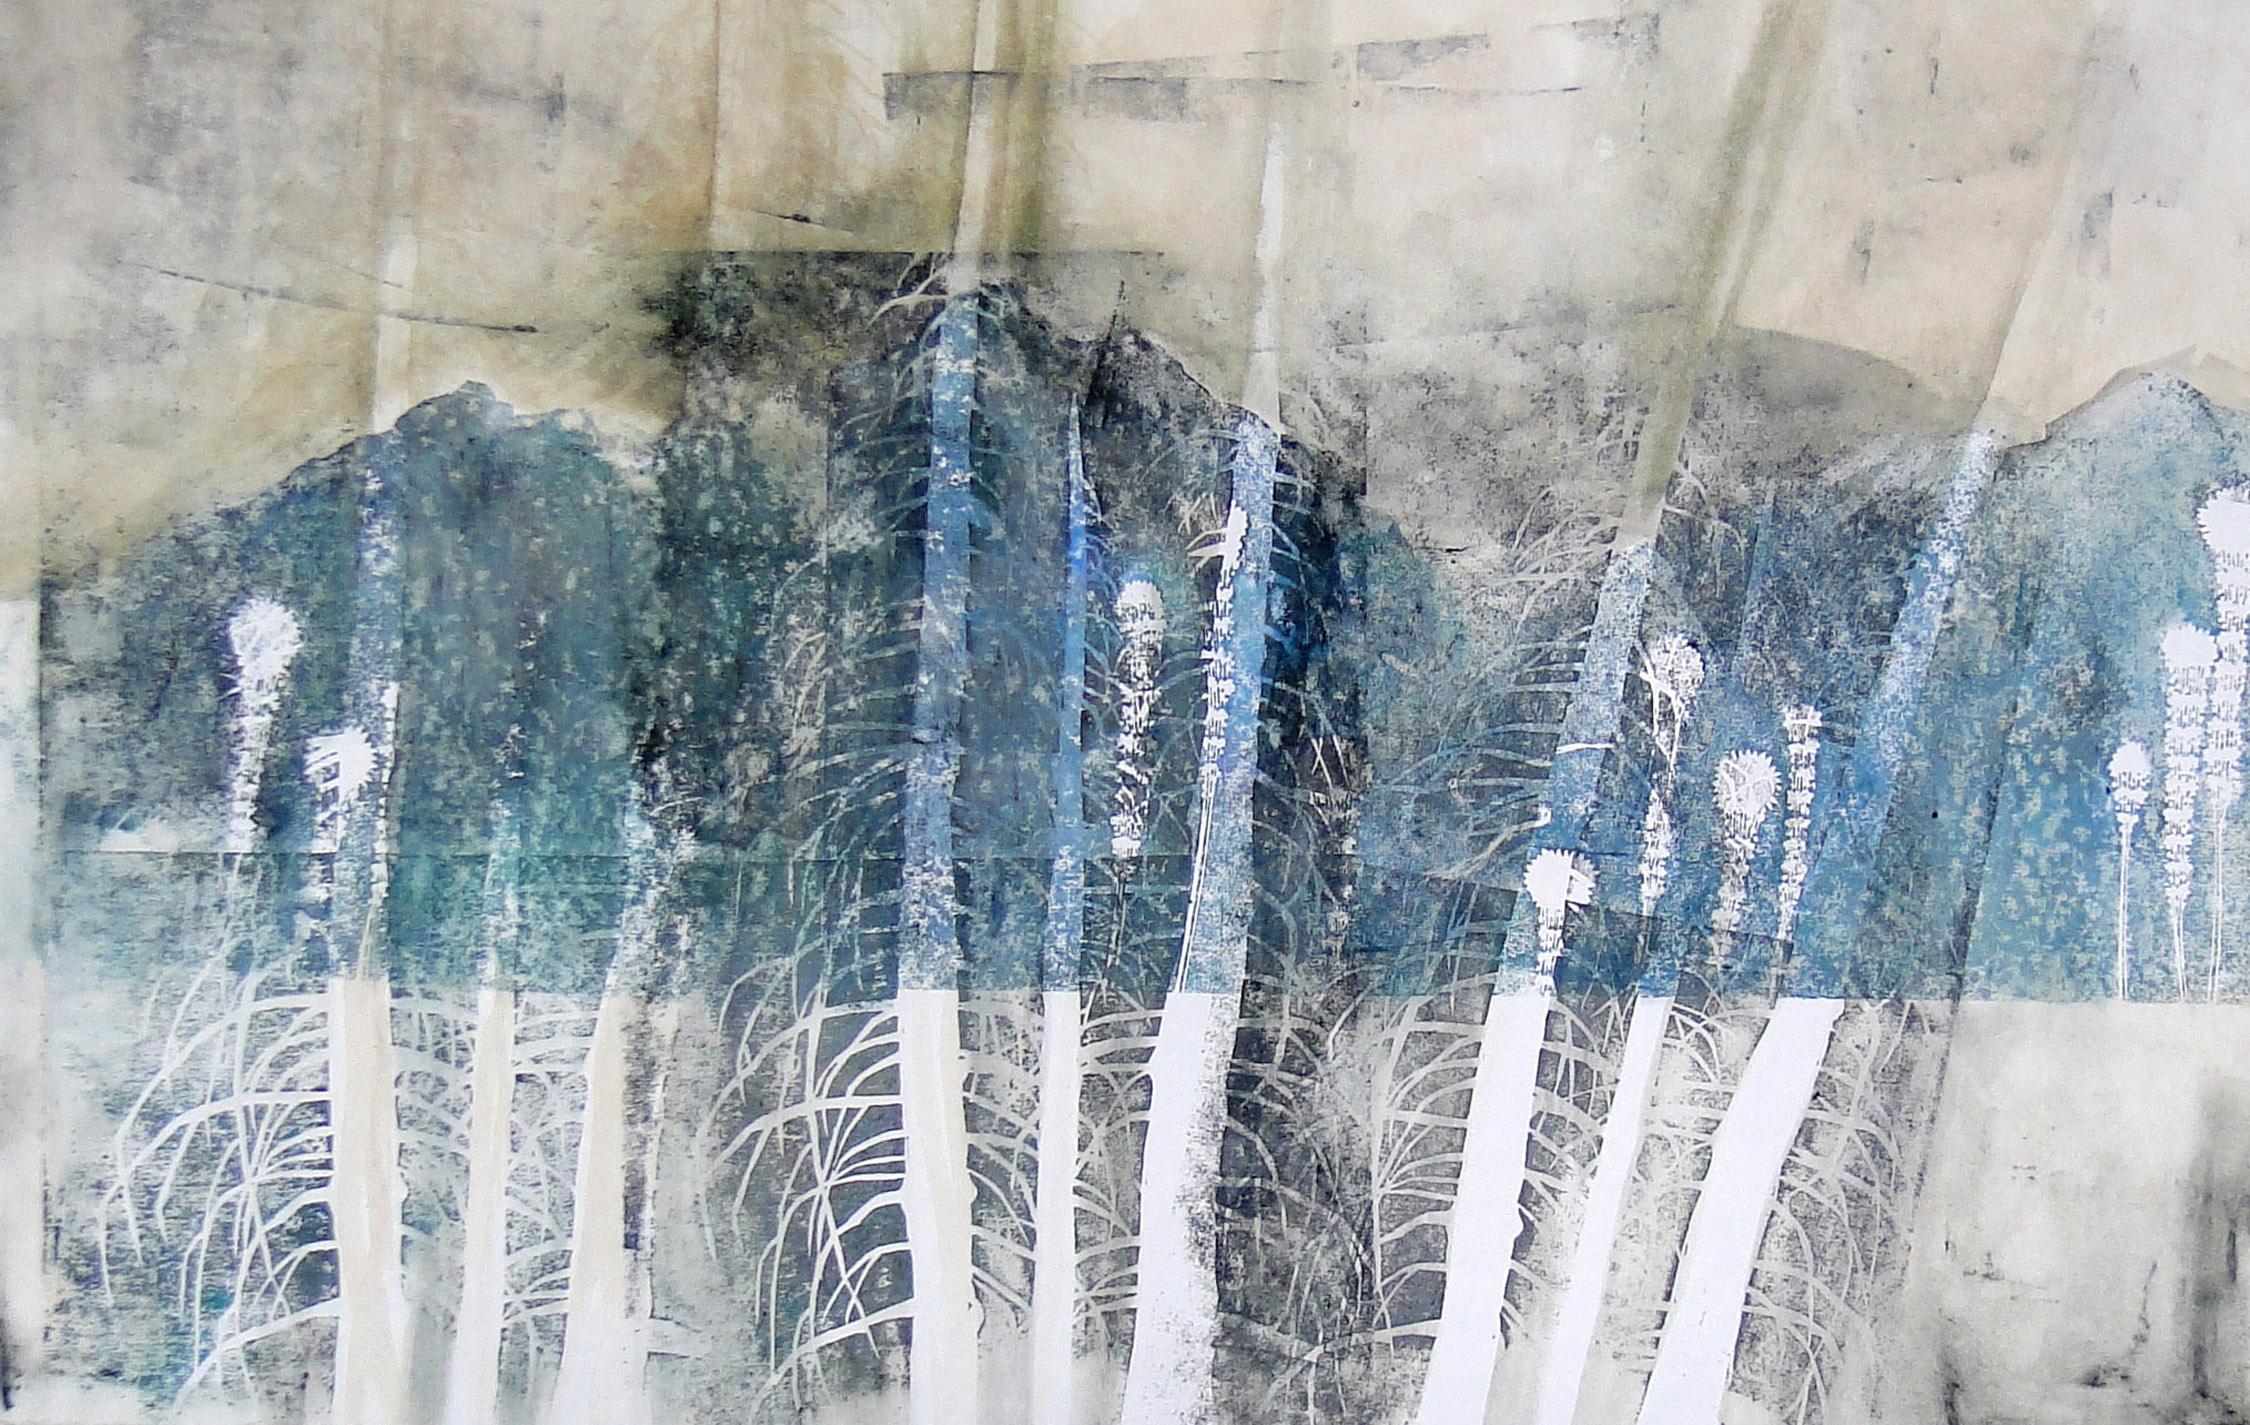 Relief print, watercolor, 2013